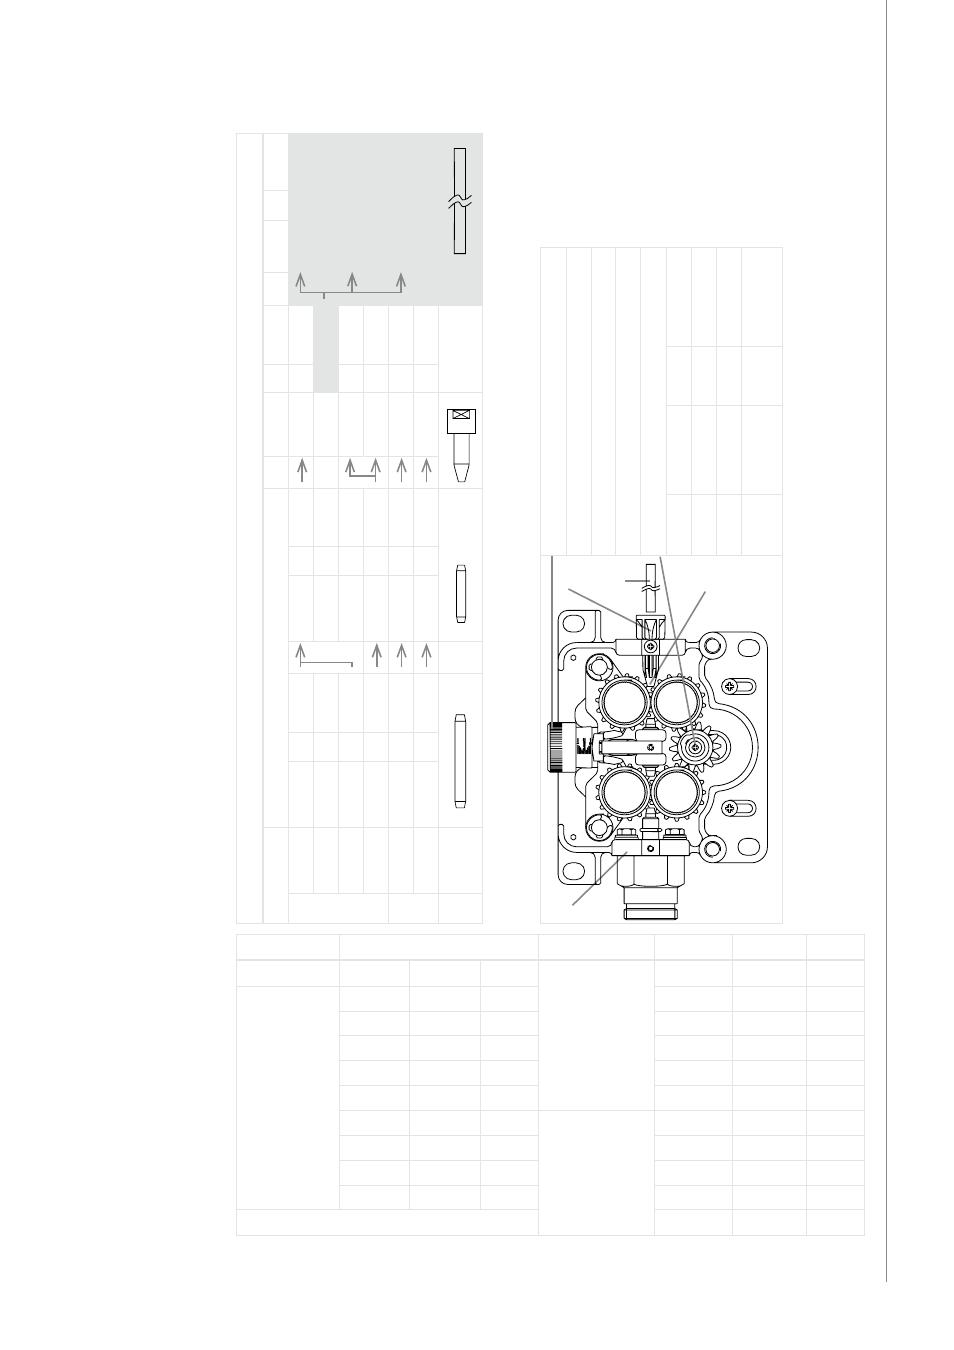 kempomat 2500 manual ebook Pioneer AVH -X5500BHS Wiring-Diagram array kemppi kempomat 2500 user manual page 9 26 also for kempomat rh manualsdir